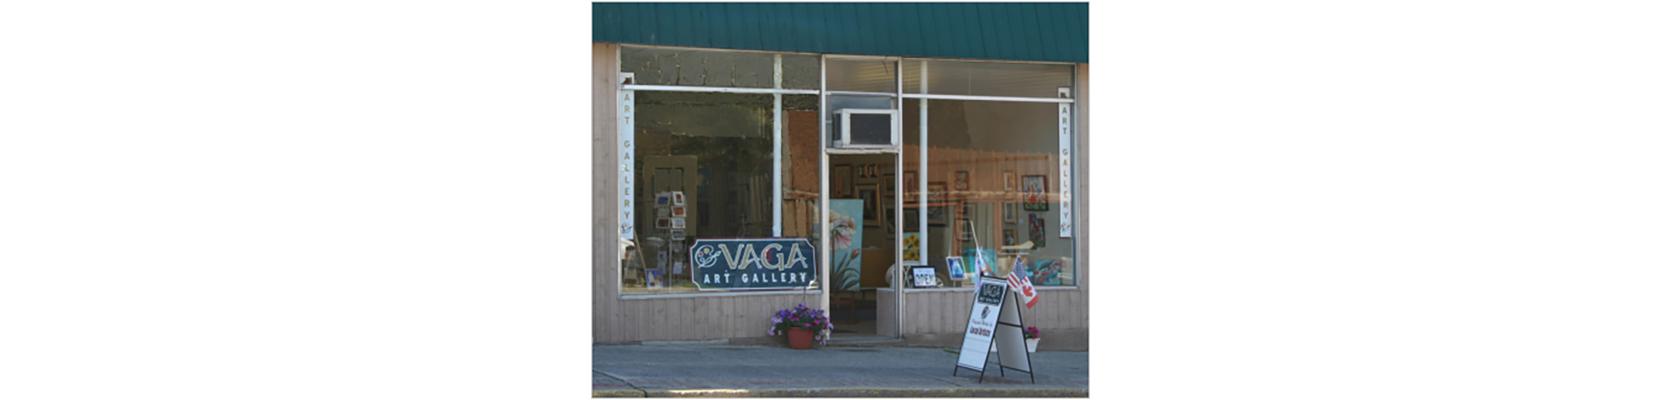 VAGA Art Gallery Featured Image